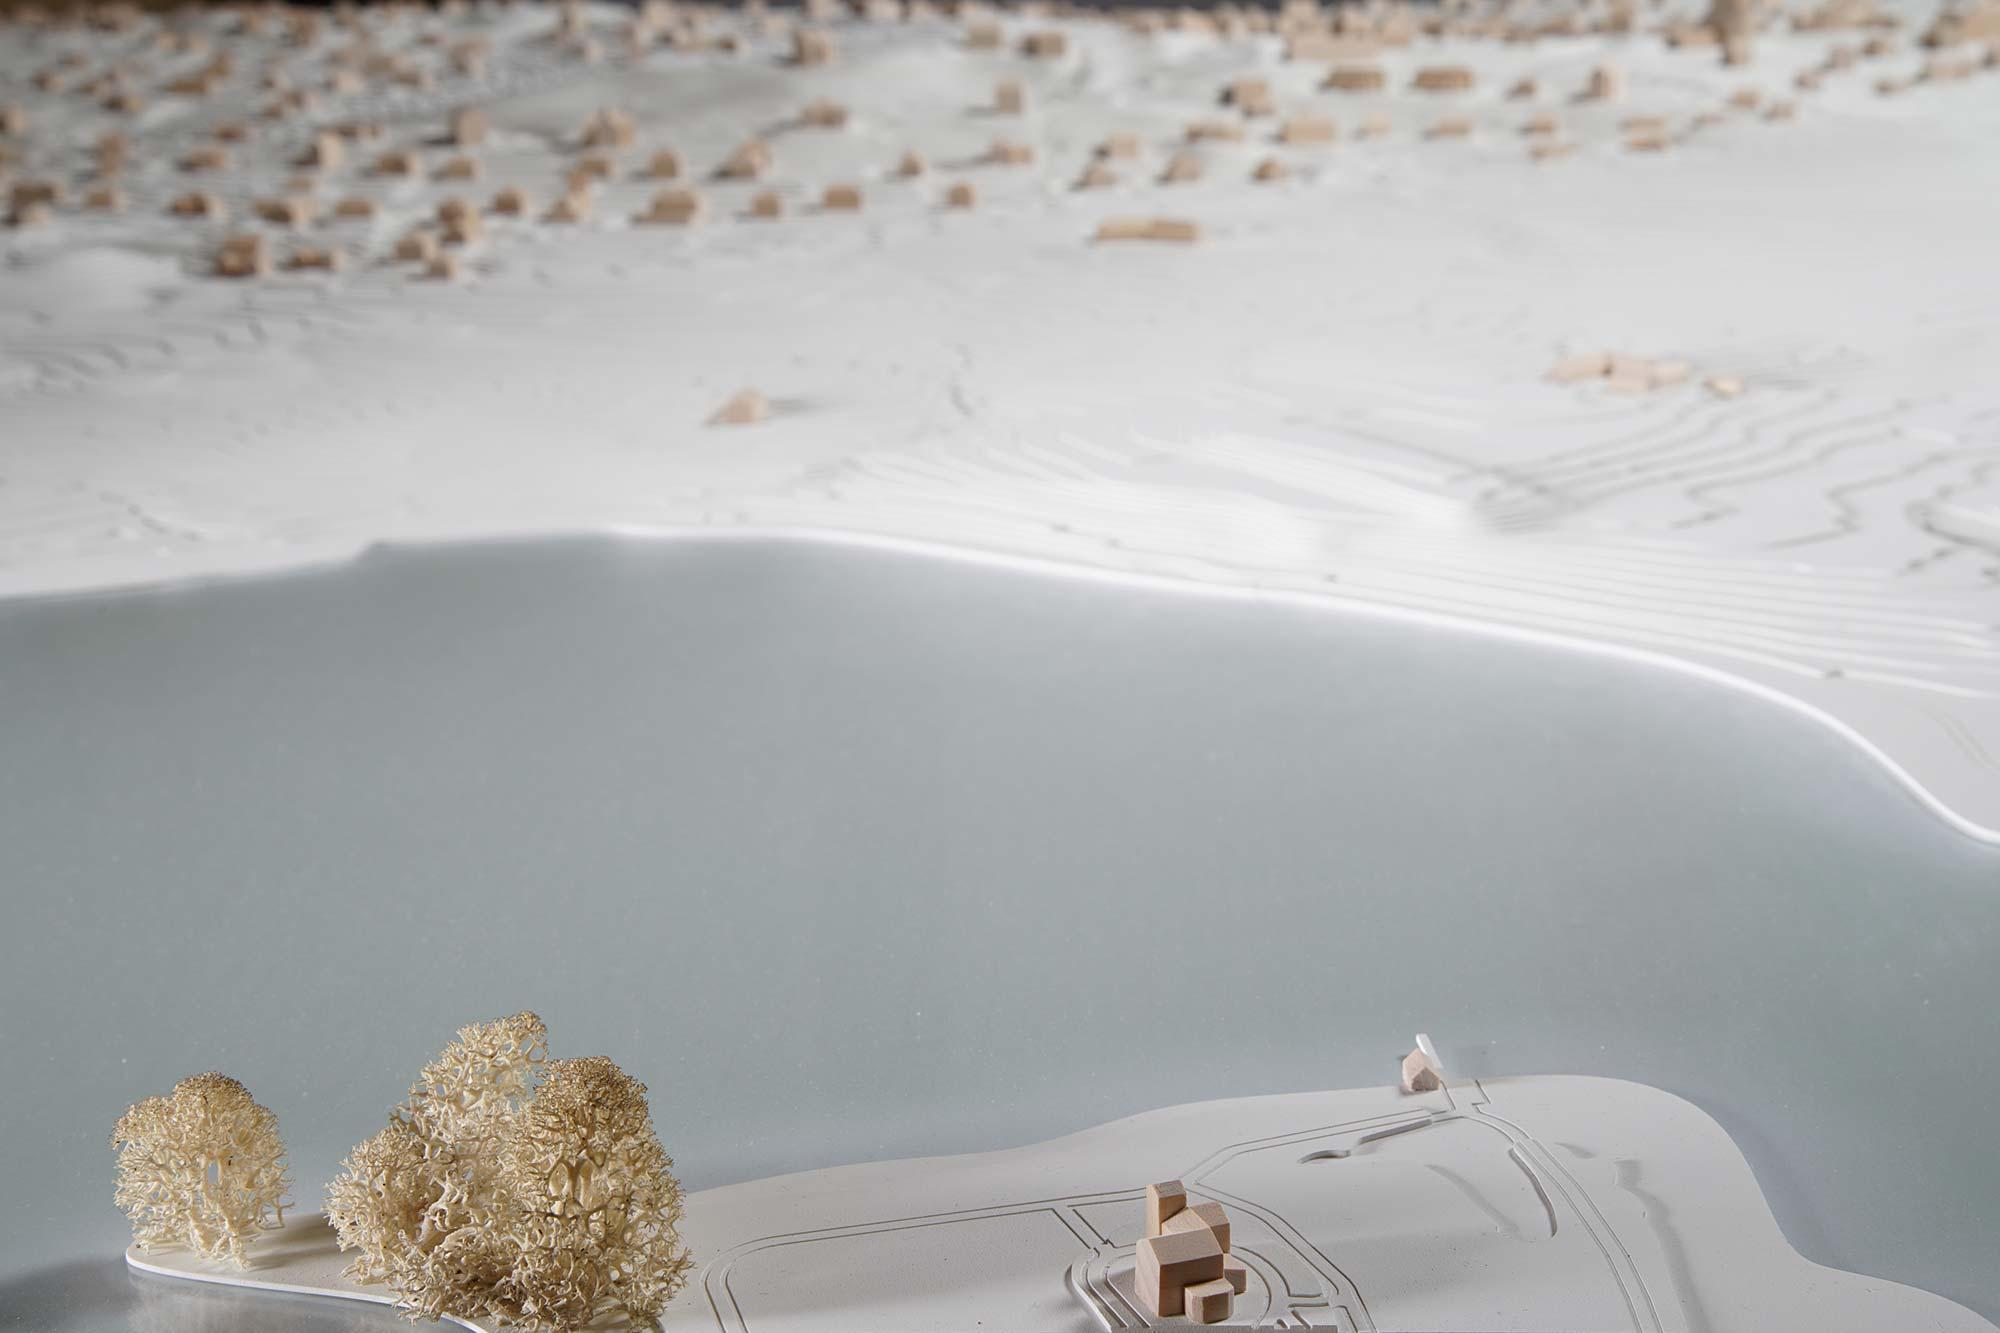 Topografisches Modell Feldafing - Seeufer mit Roseninsel